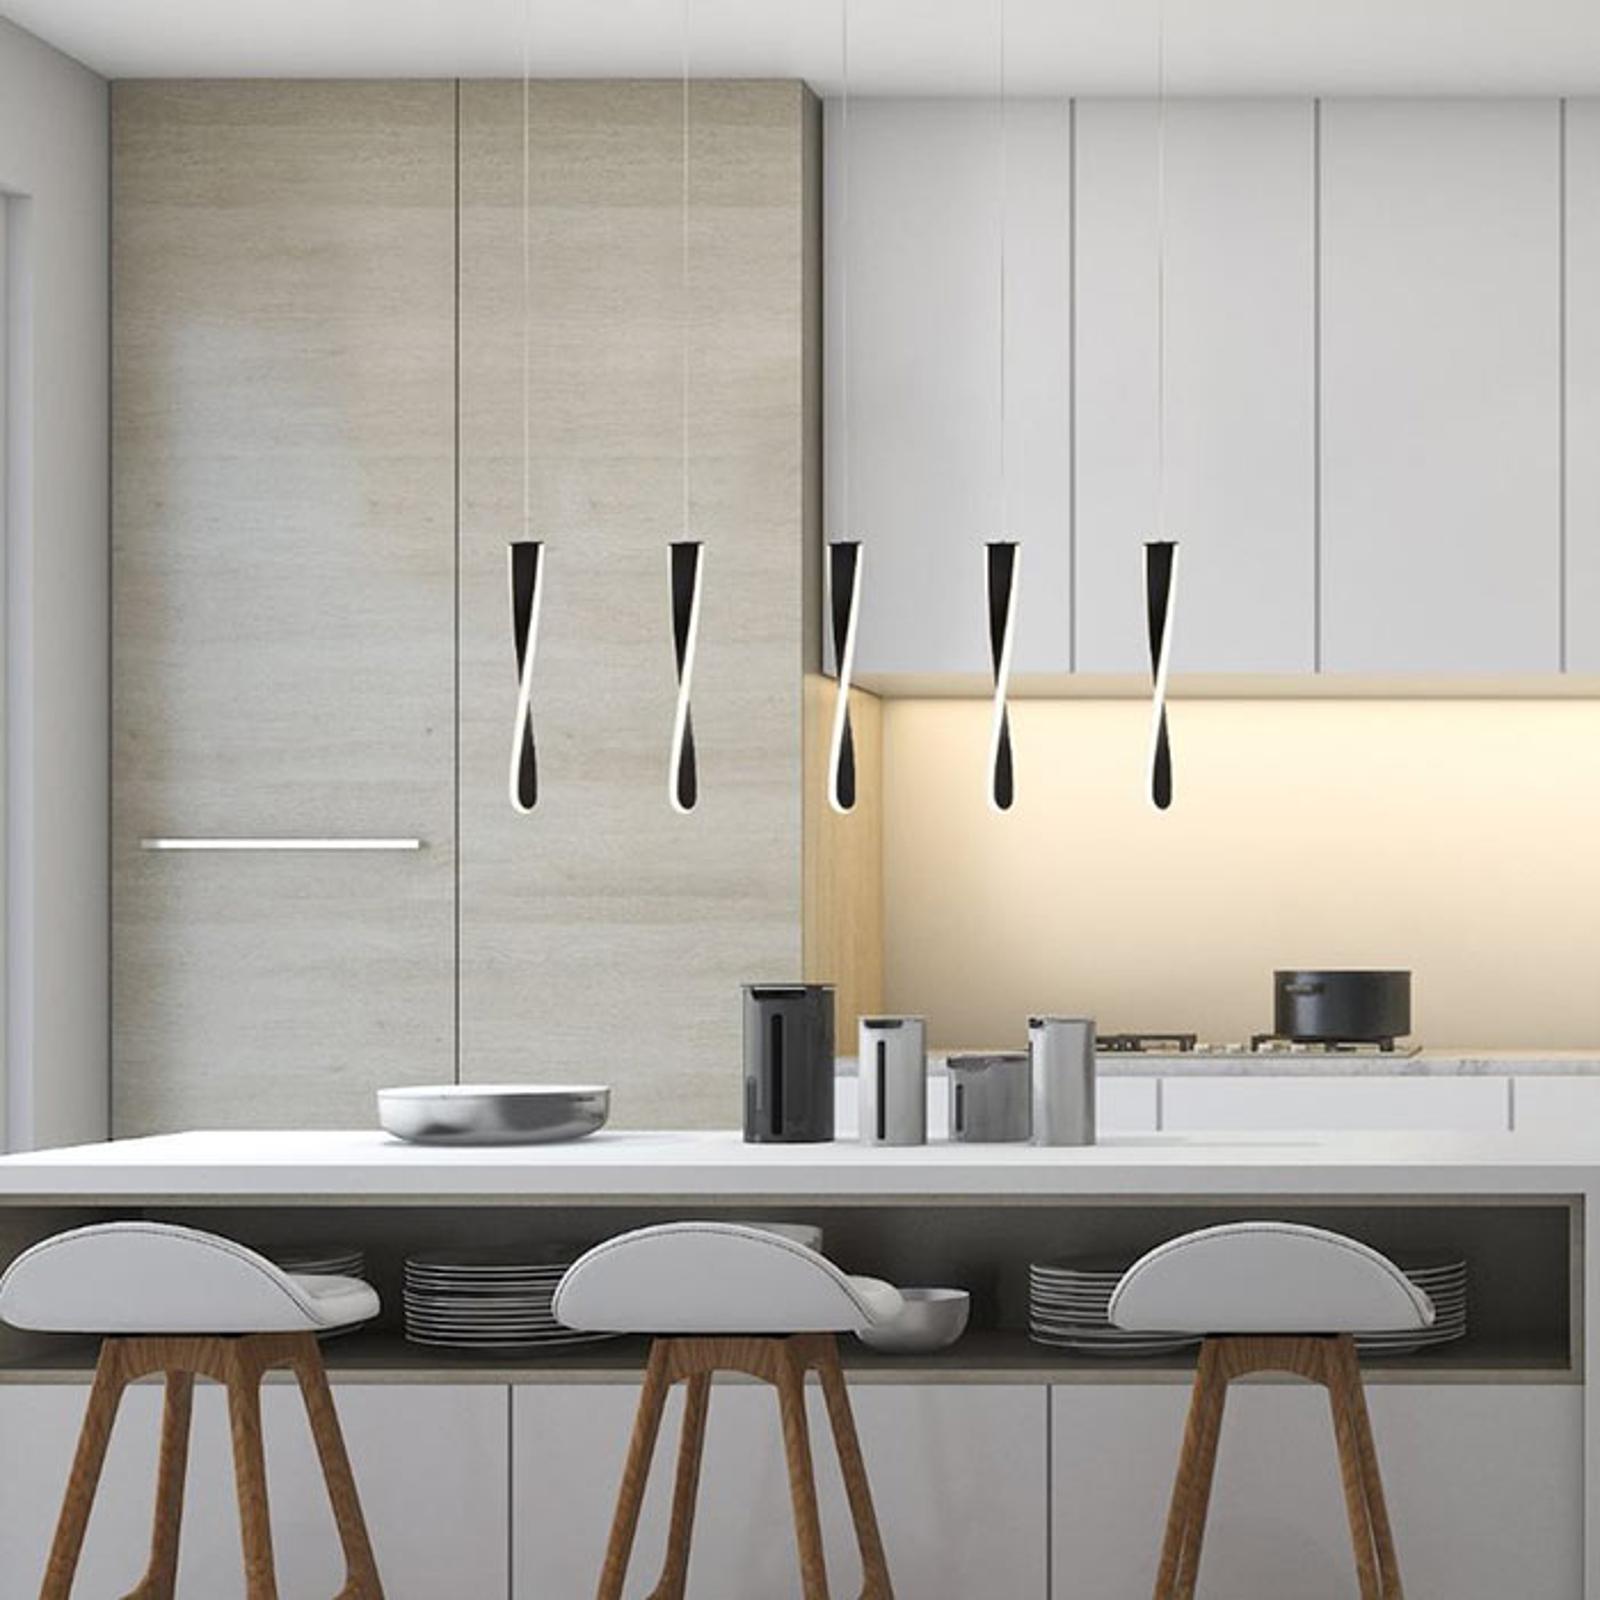 LED hanglamp Paddle, 5-lamps